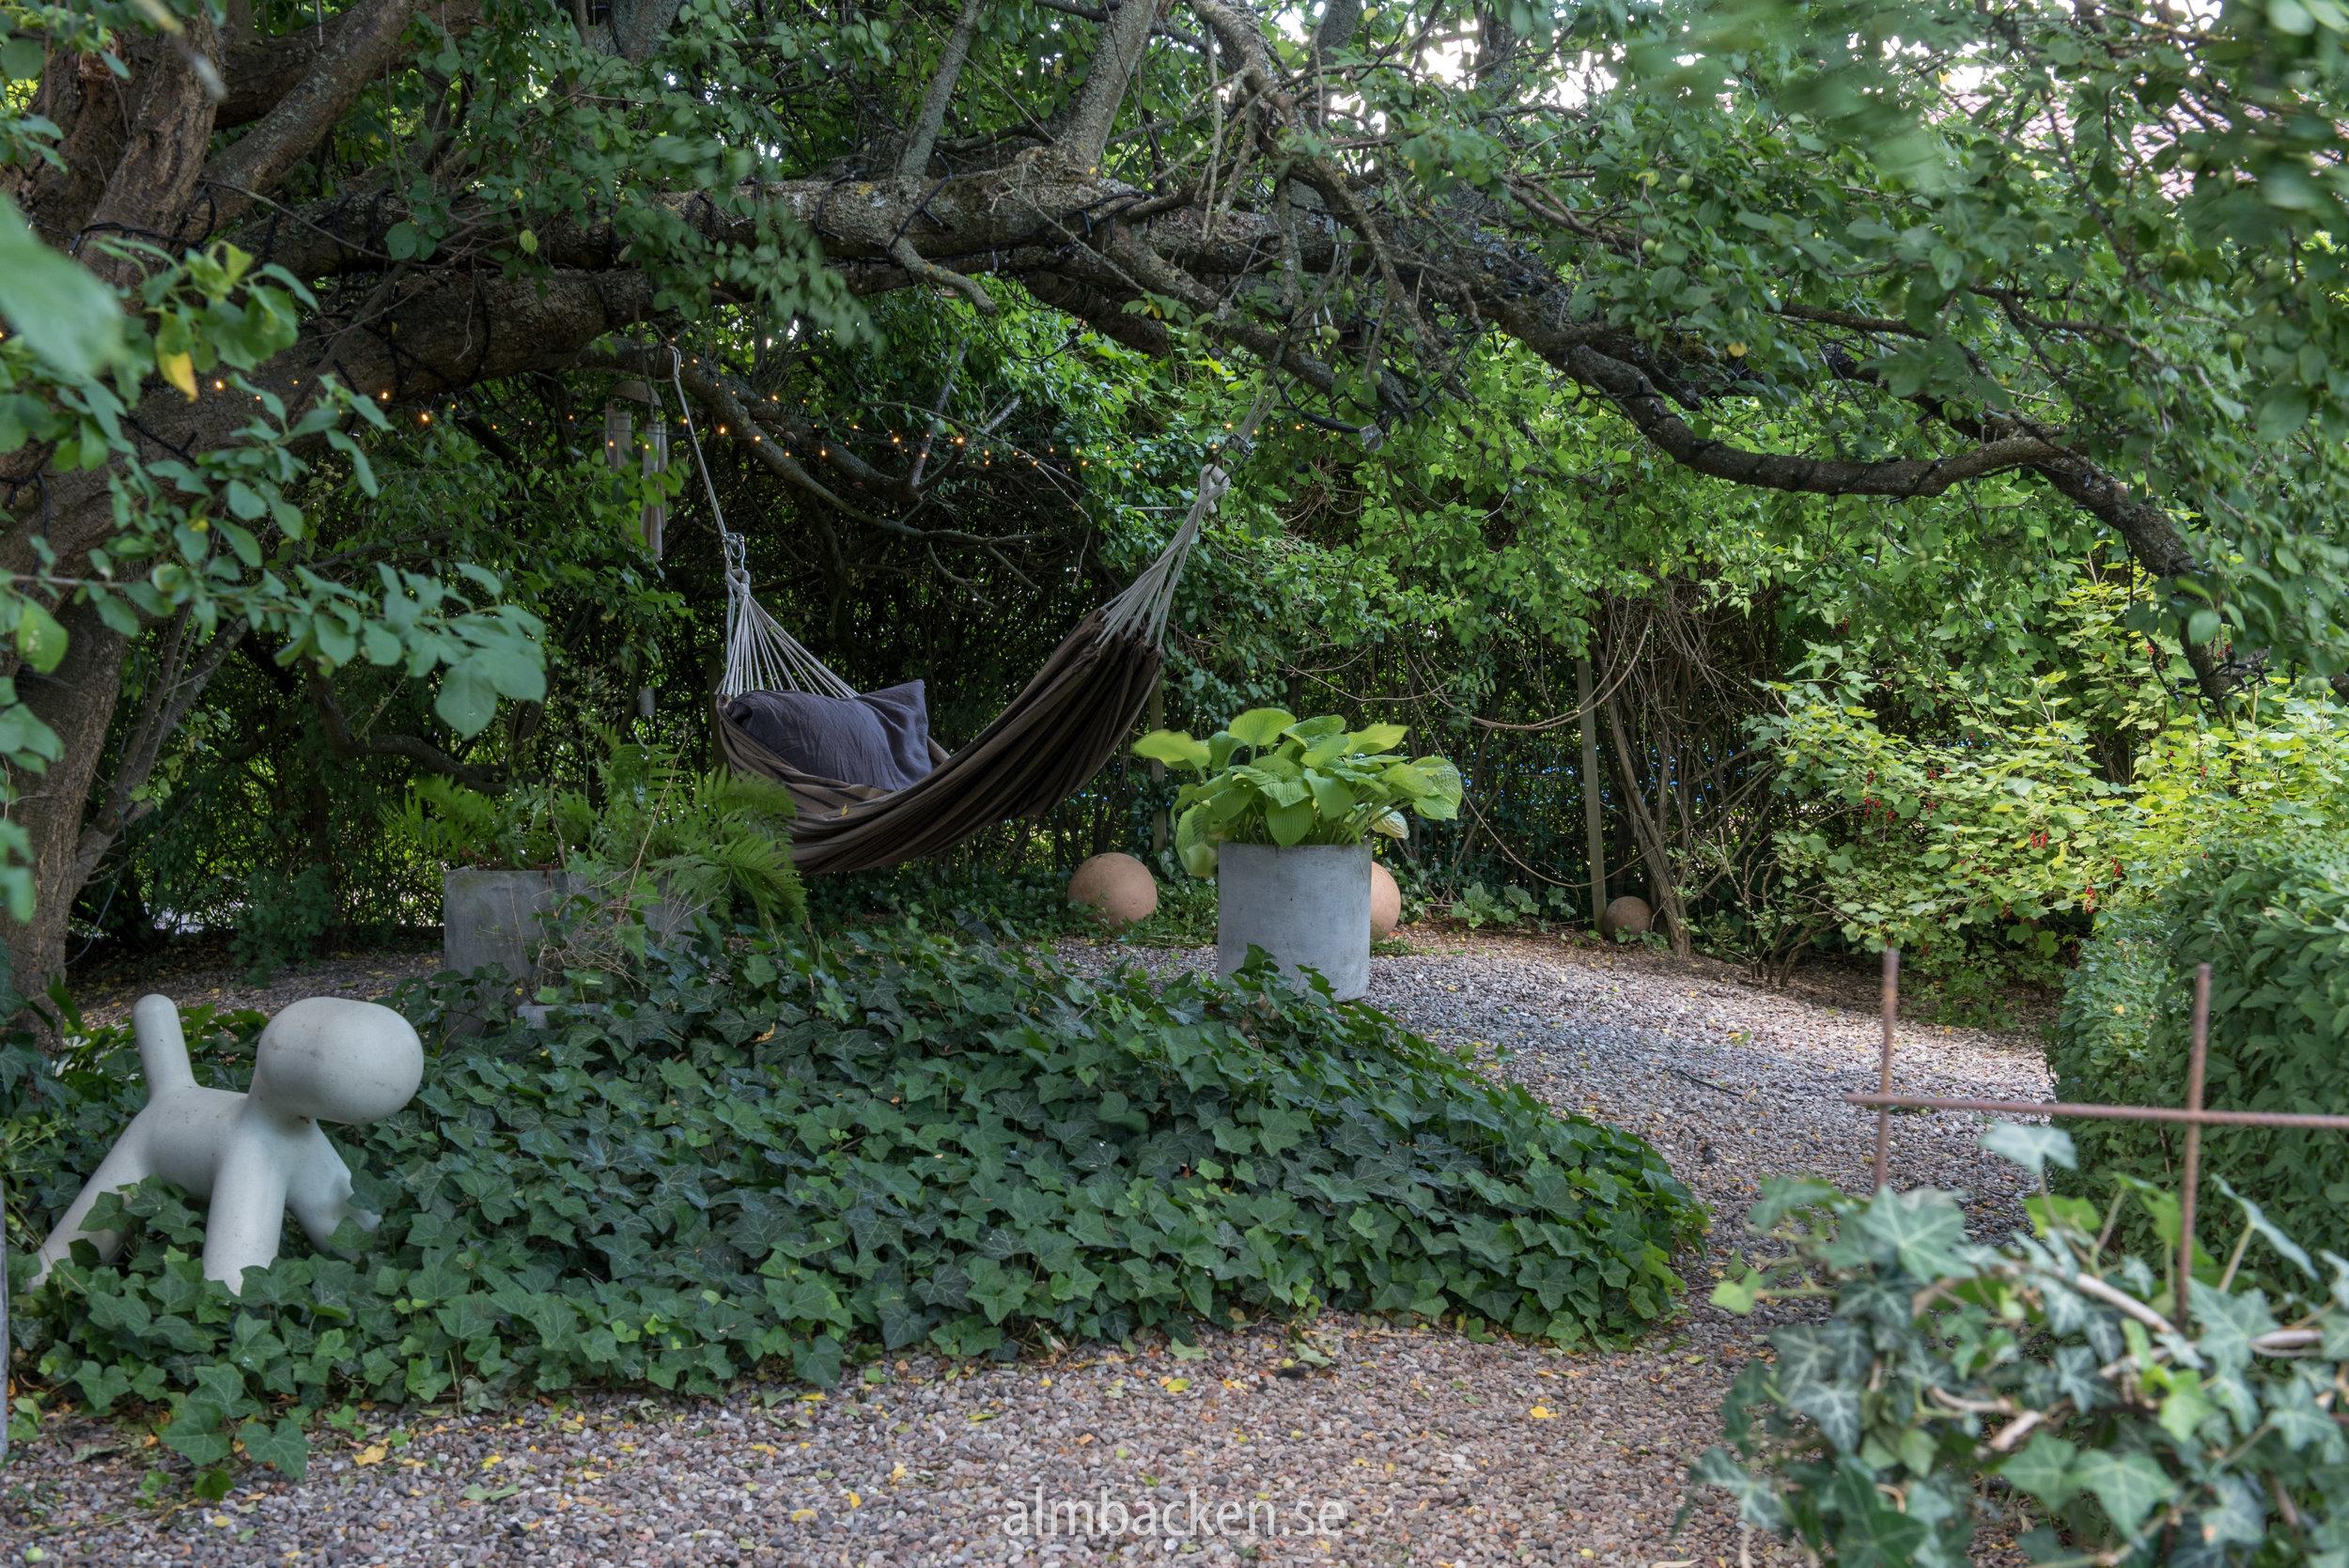 Charltottas trädgård-15.jpg